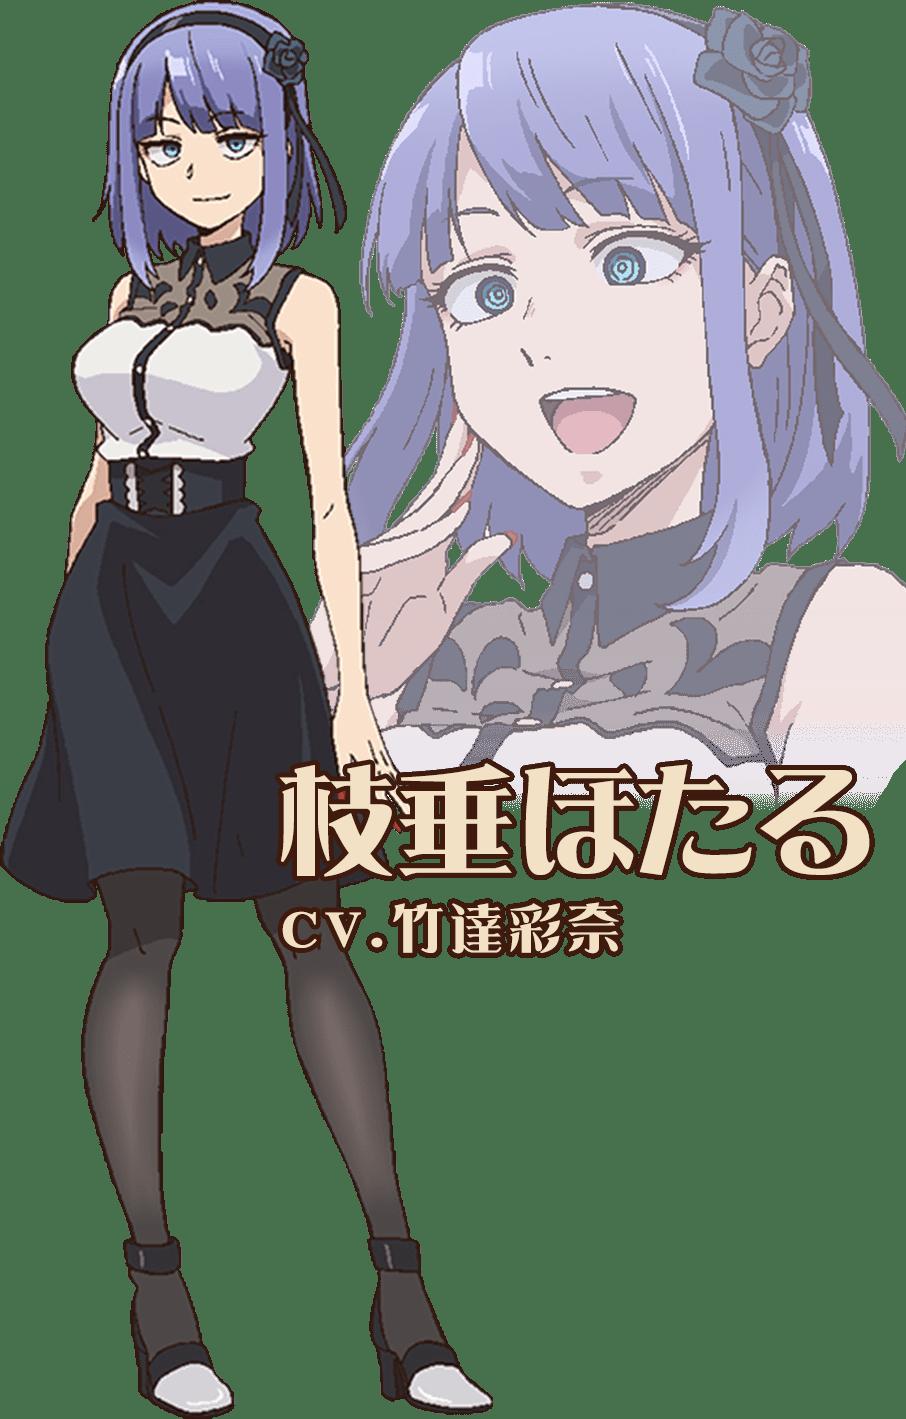 https://ami.animecharactersdatabase.com/uploads/chars/42711-376496294.png